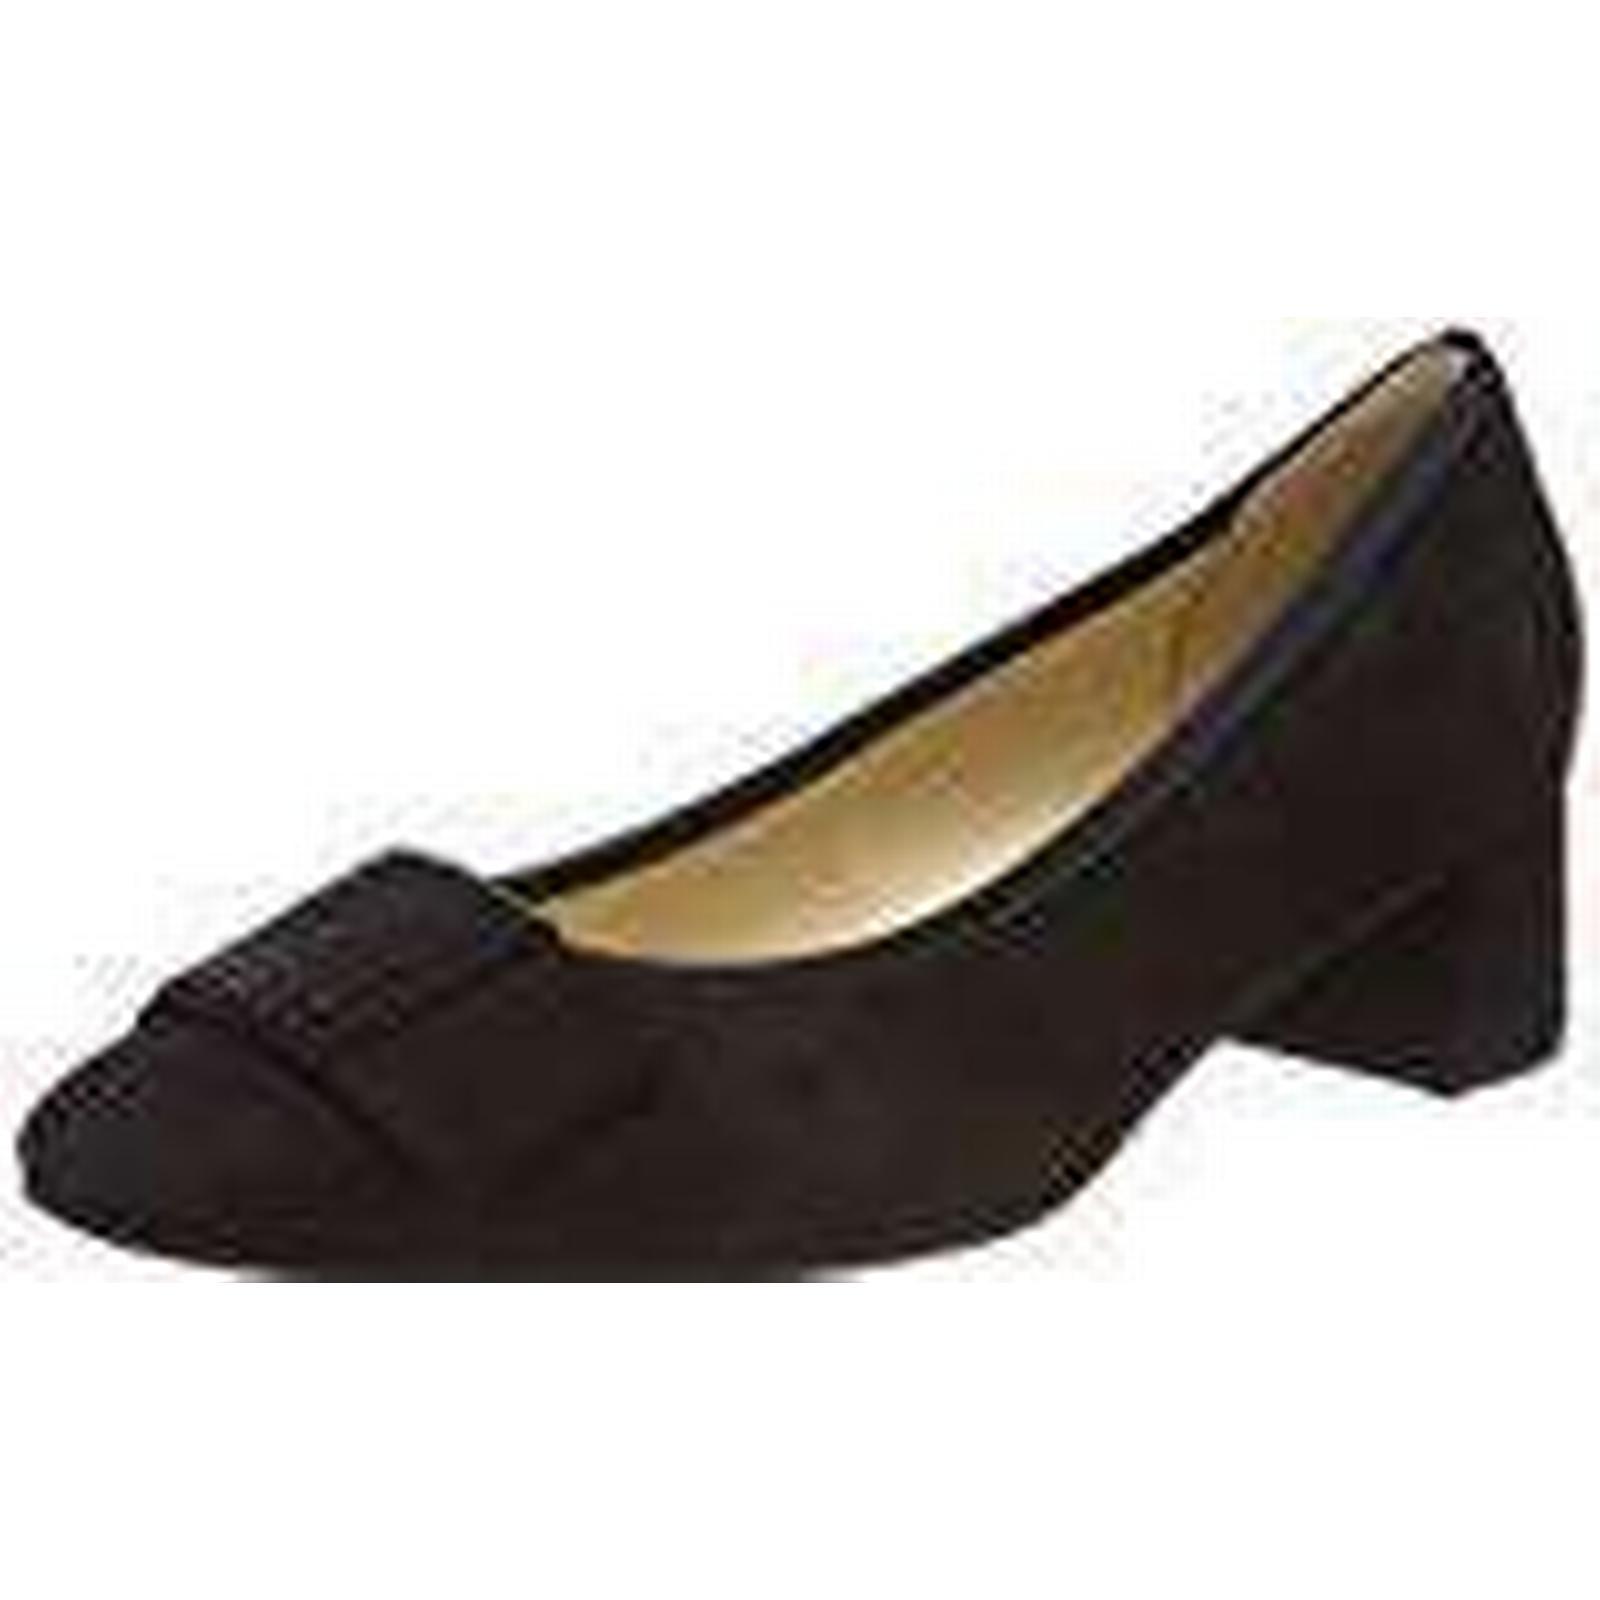 Gabor Shoes Women''s Schwarz, Basic Closed-Toe Pumps, Black Schwarz, Women''s 3.5 UK db7c37